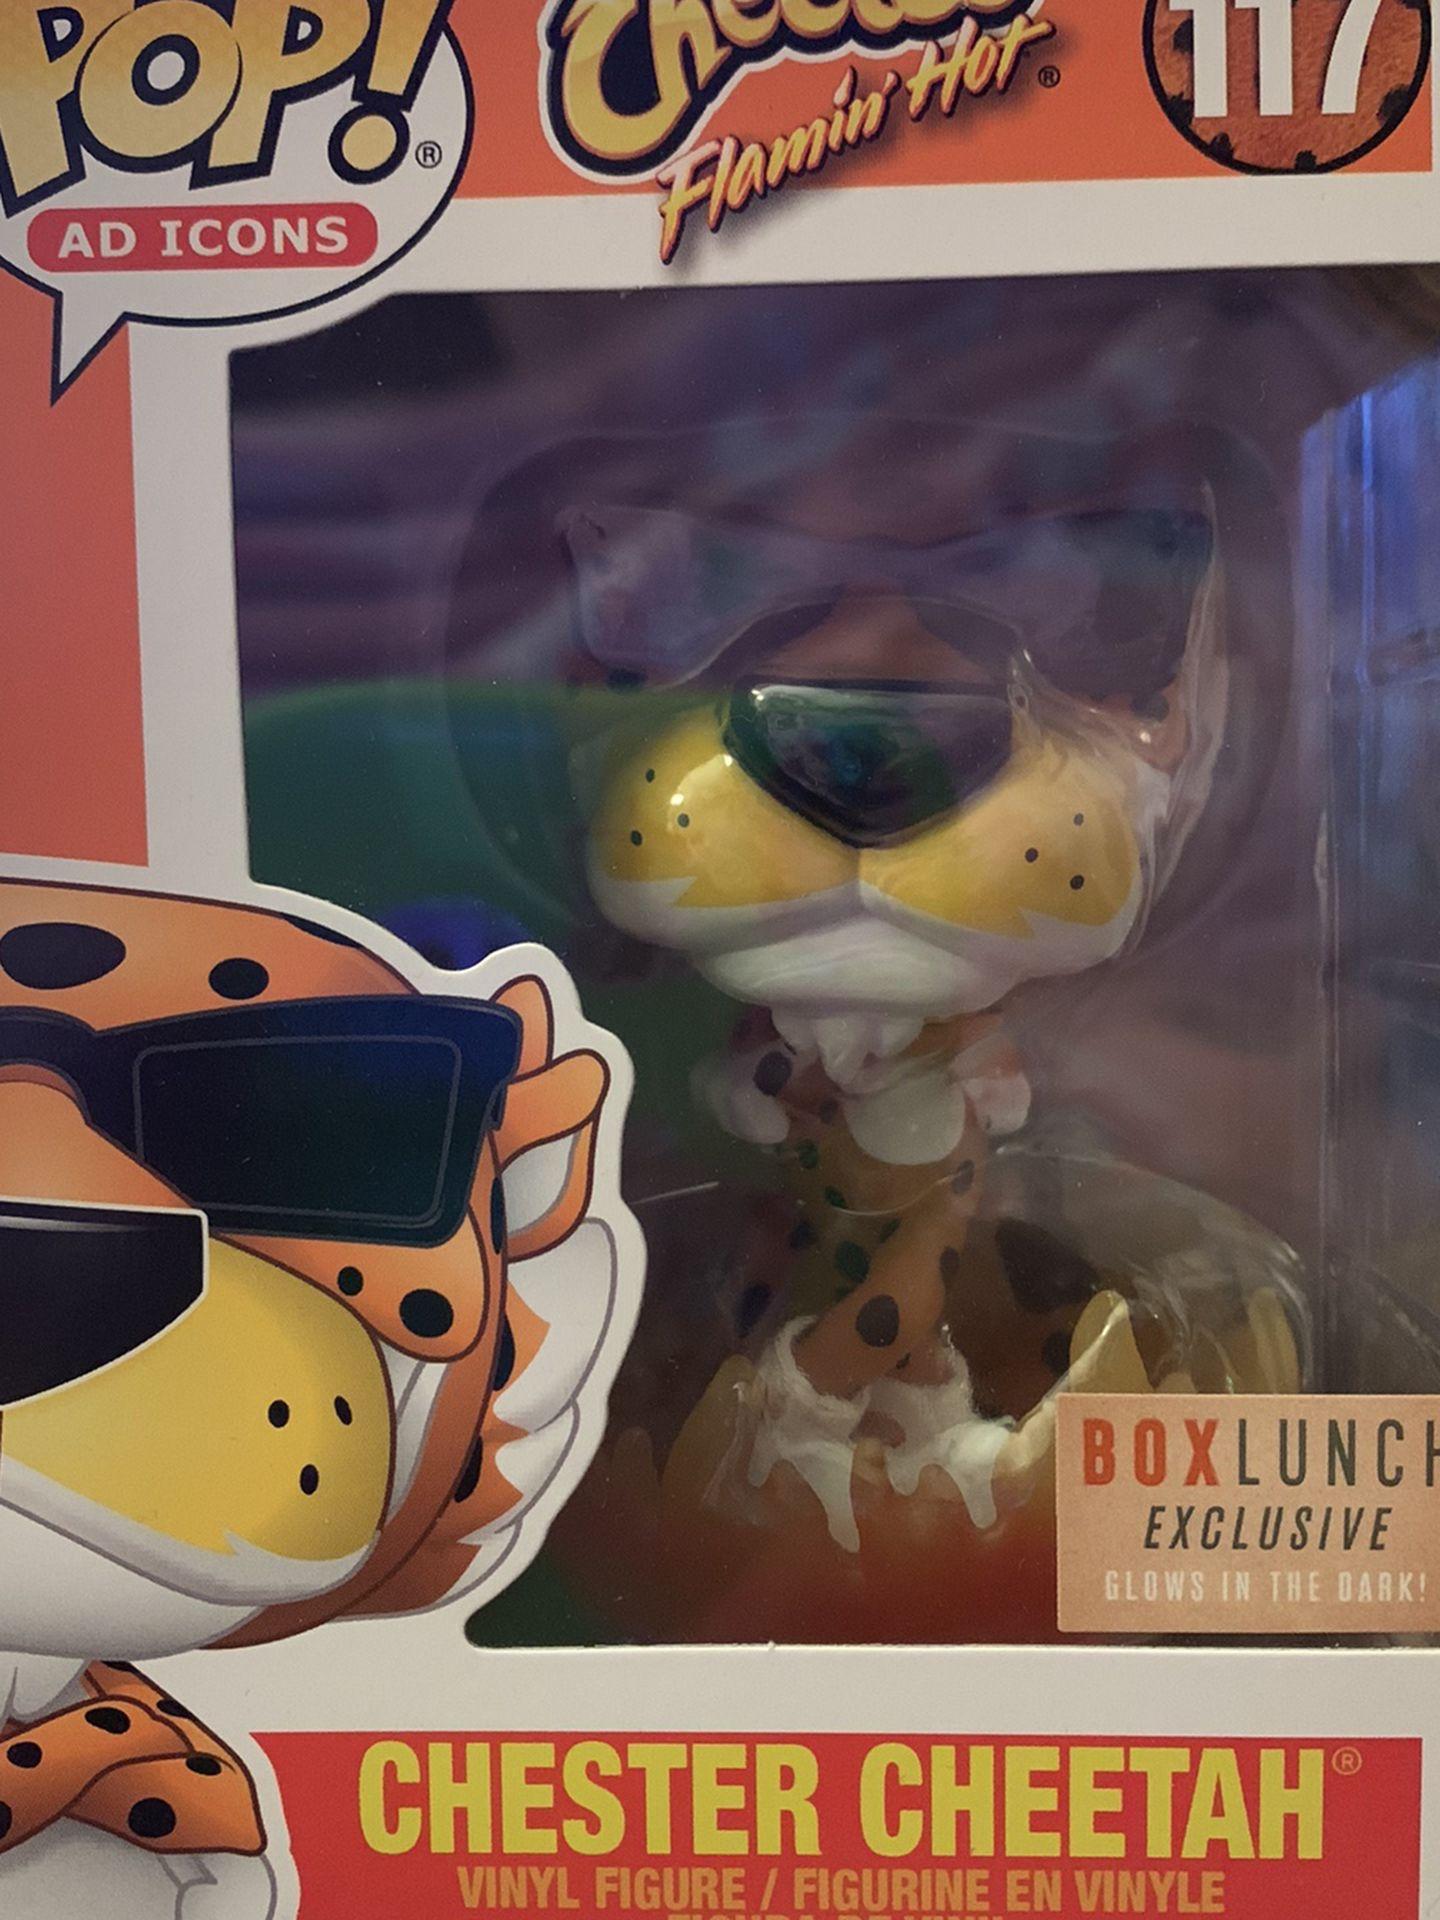 Flaming hot Chester Cheetah Funko Boxlunch Pop